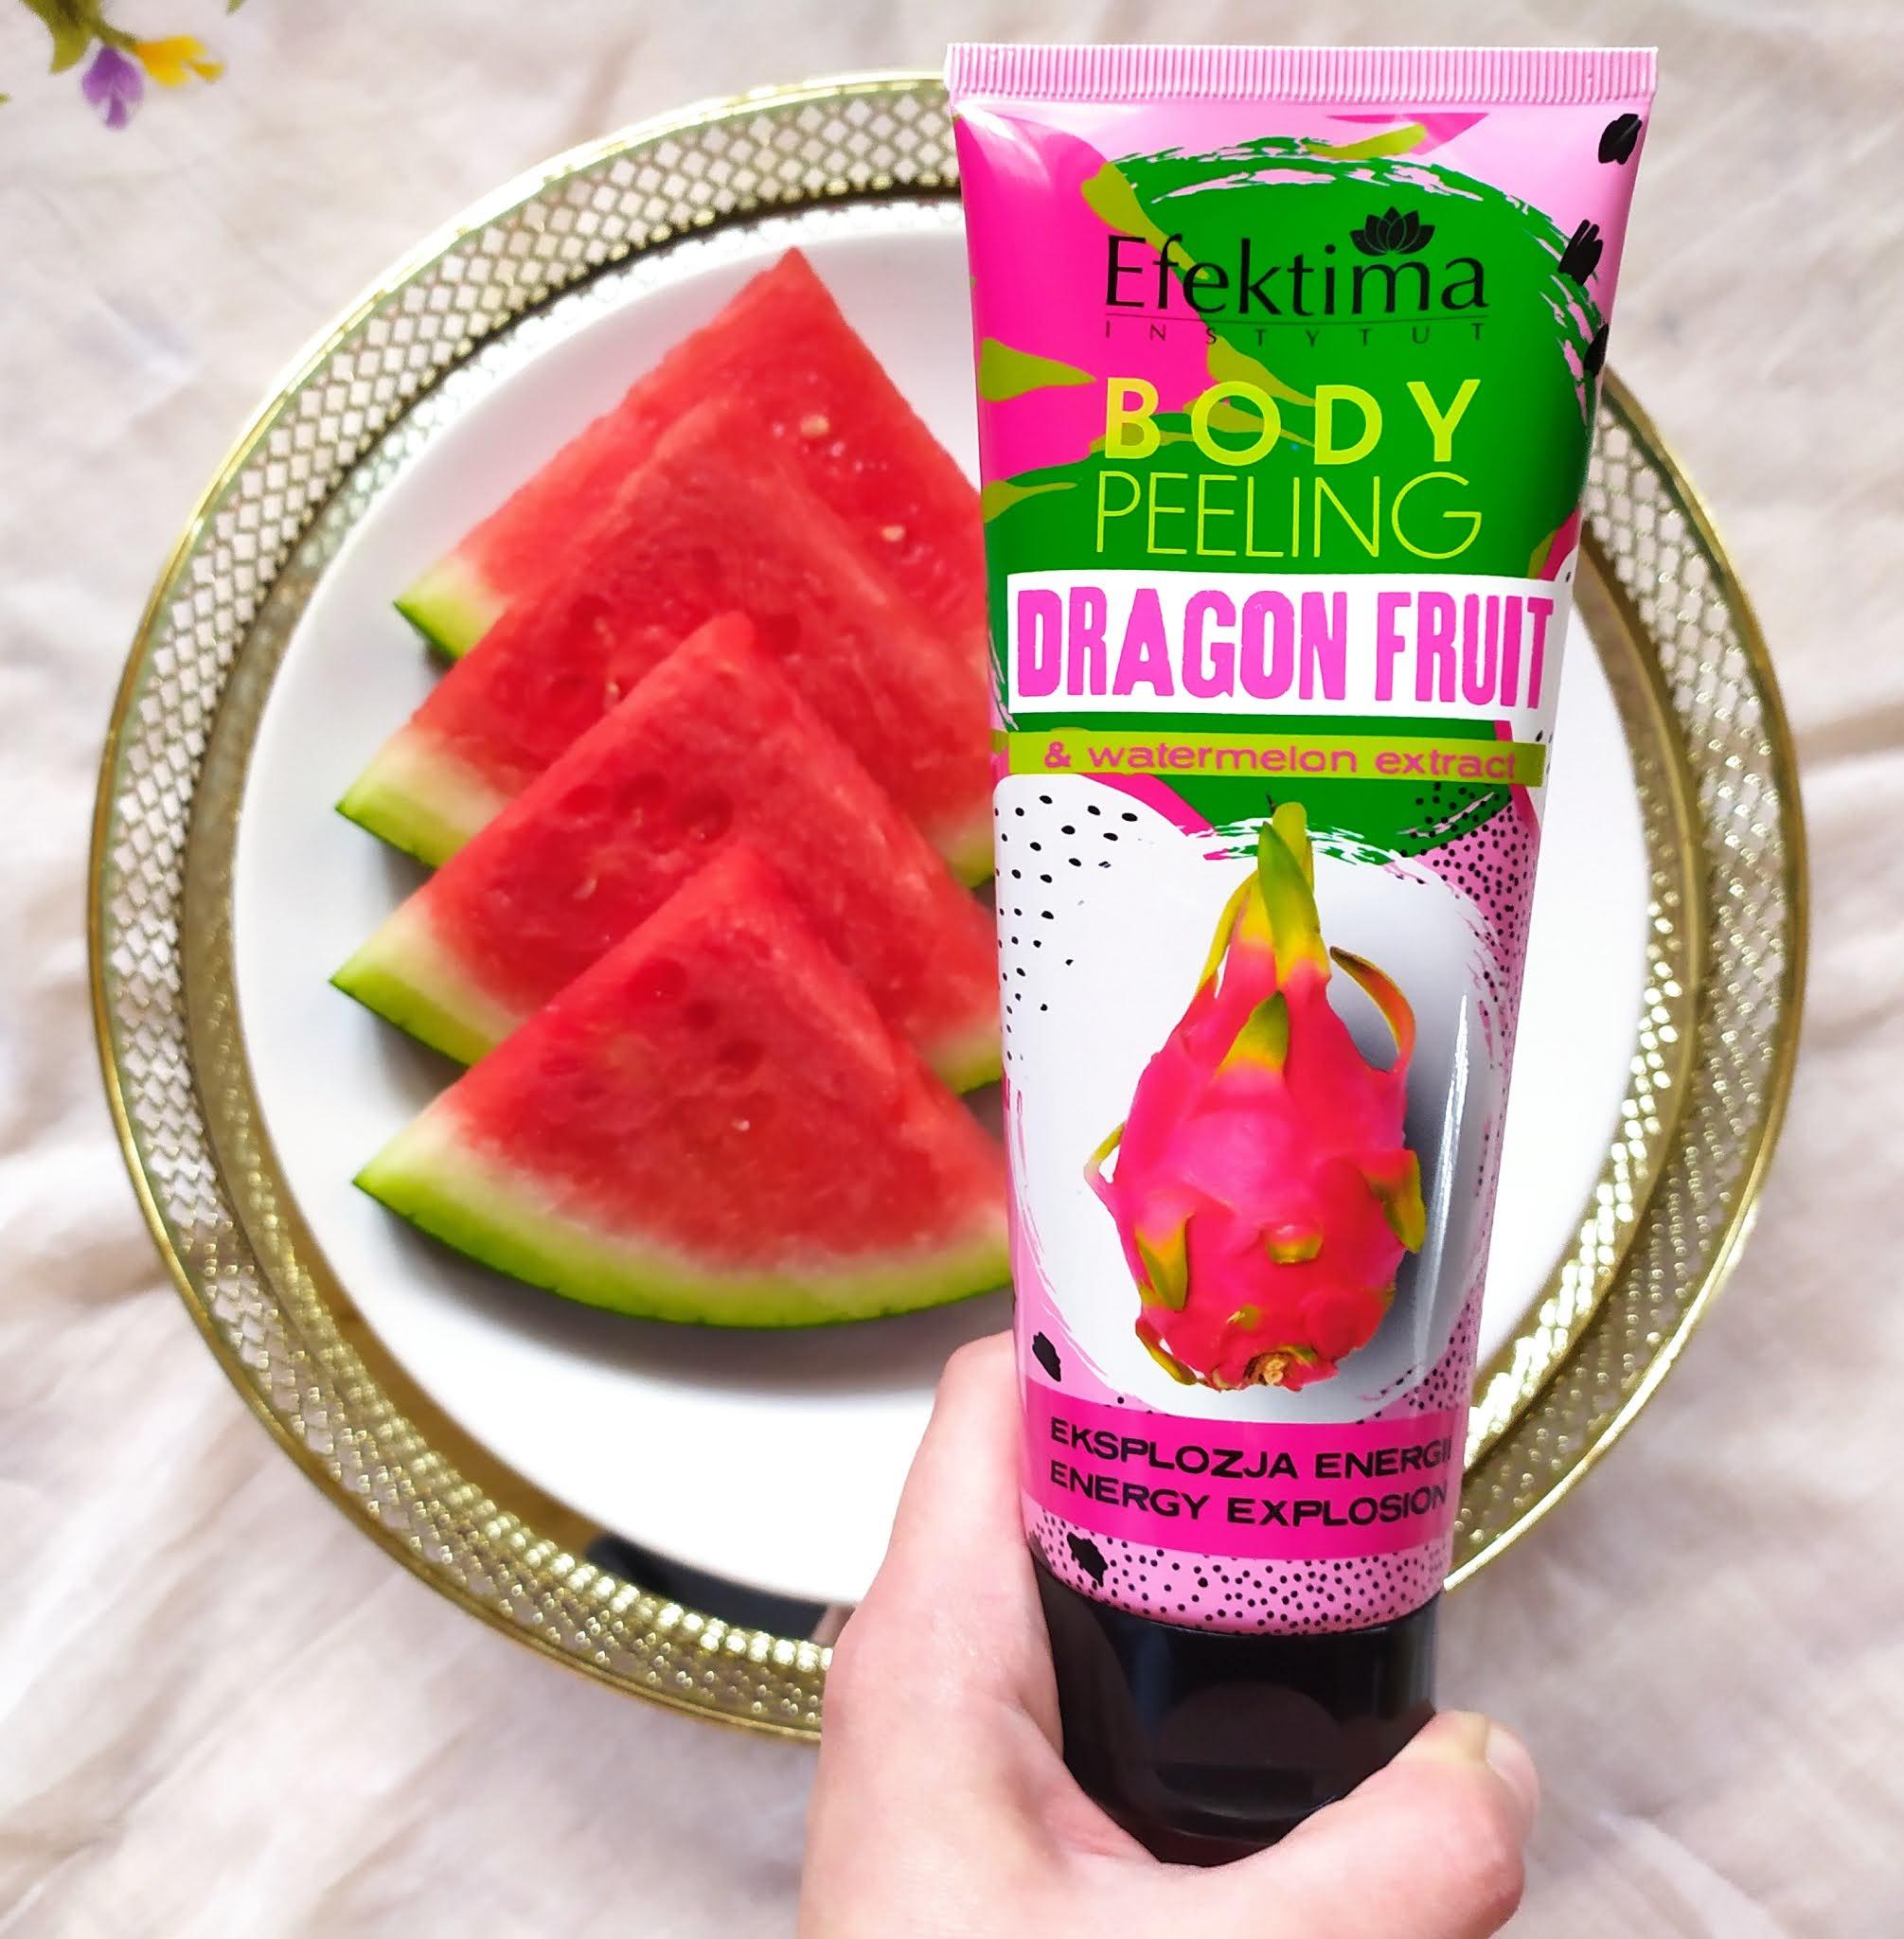 Recenzja - Efektima body peeling dragon fruit & watermelon extract